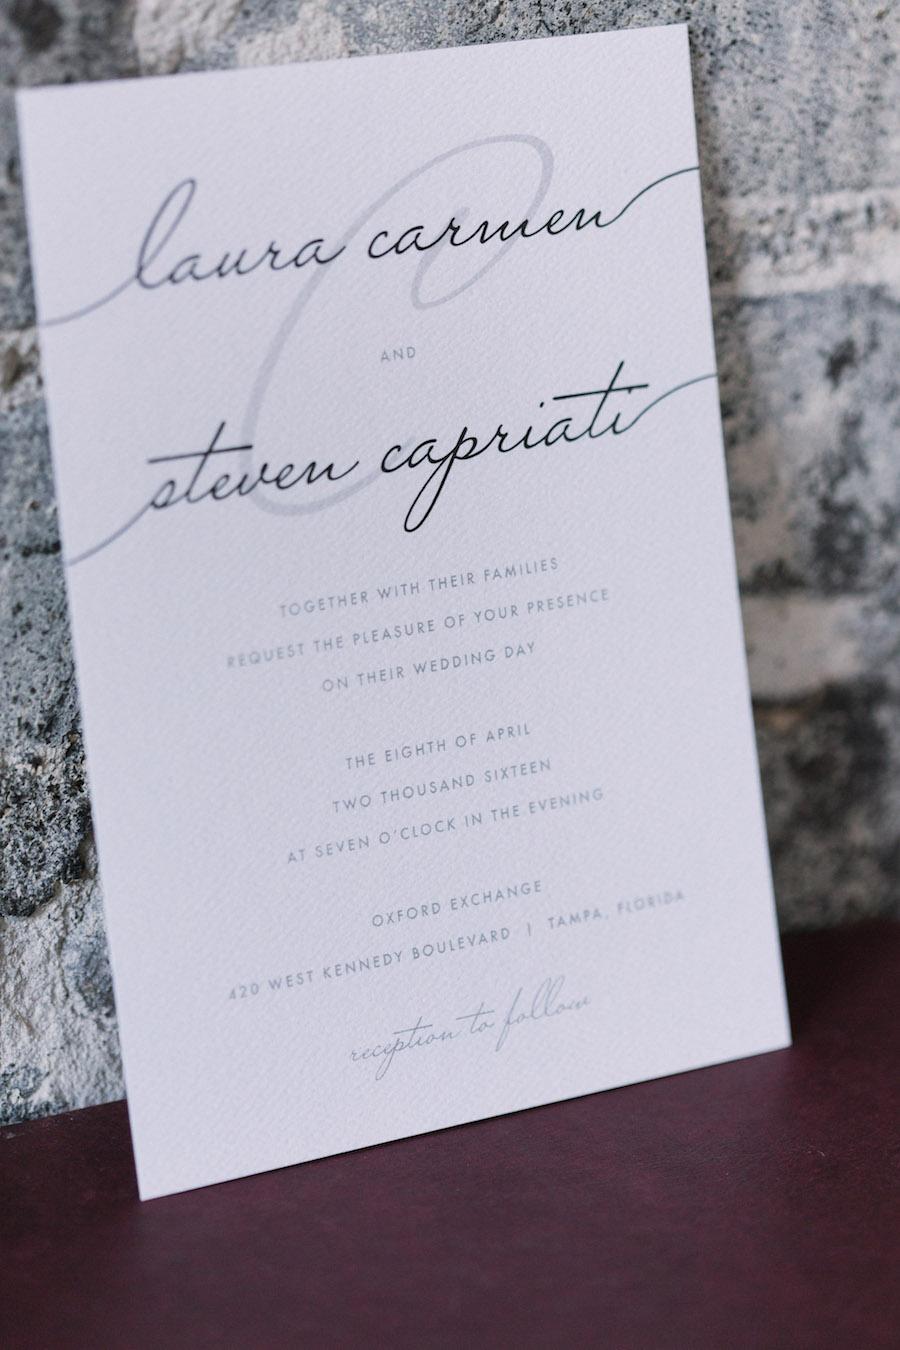 Elegant Black and White Wedding Invitation Stationery with Calligraphy